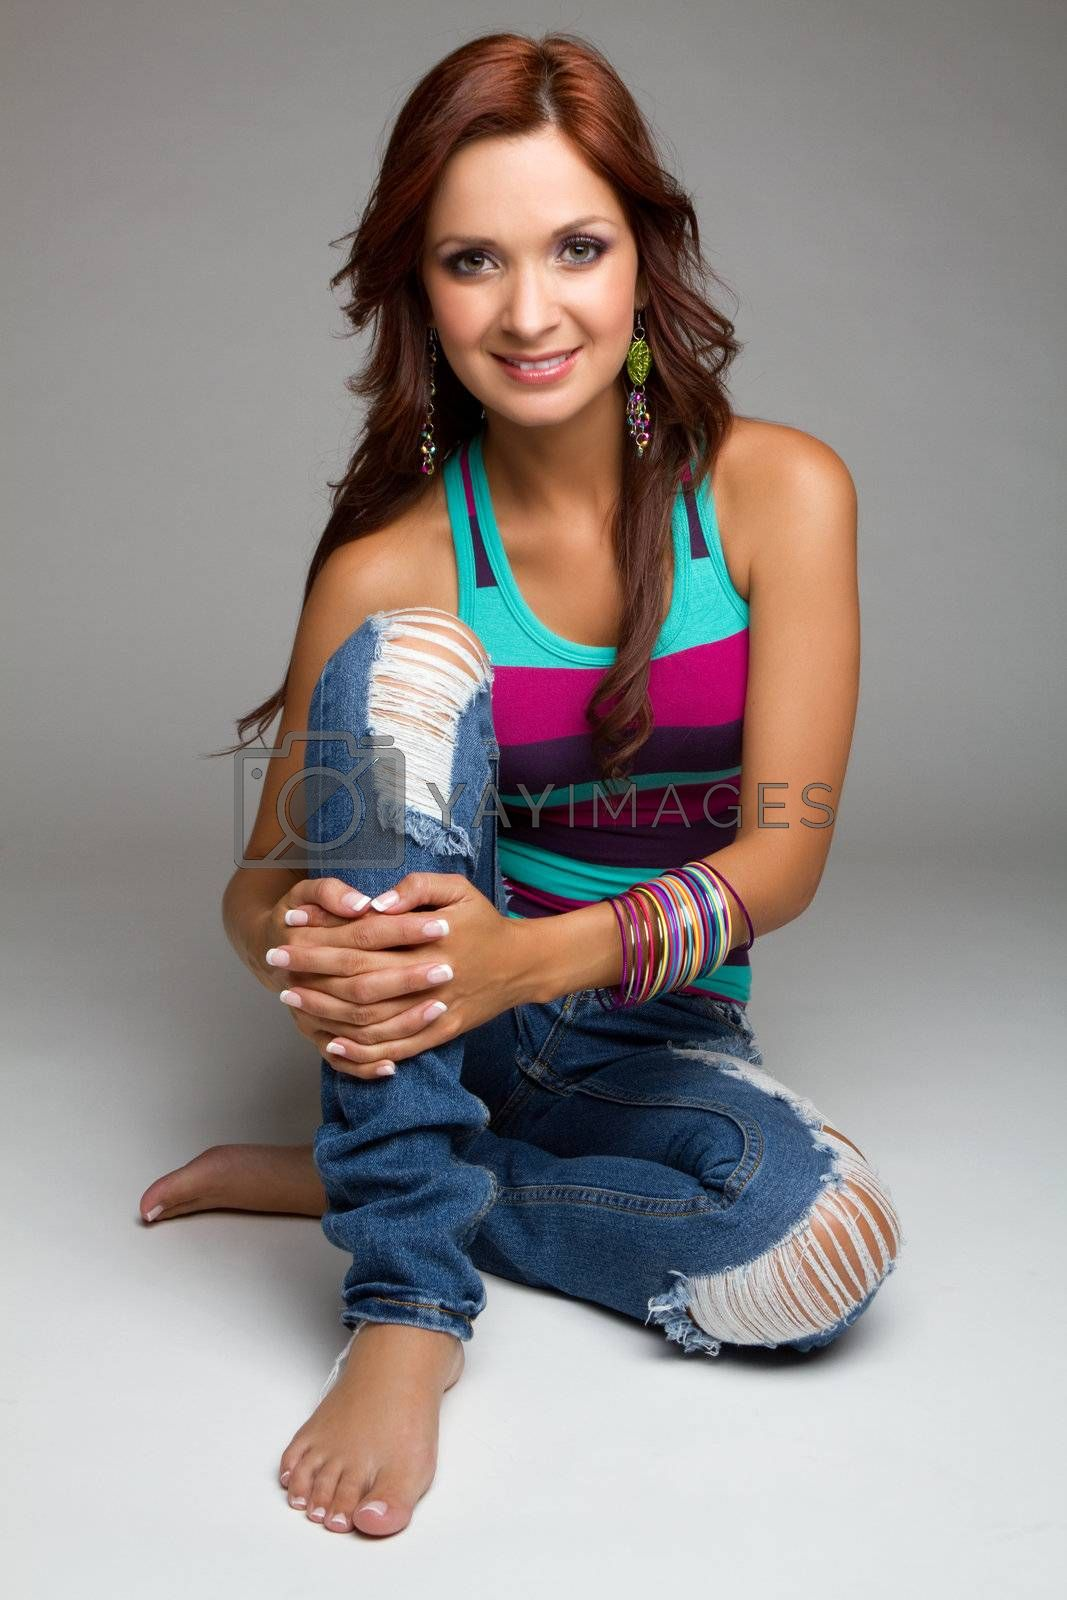 Beautiful sitting young woman smiling